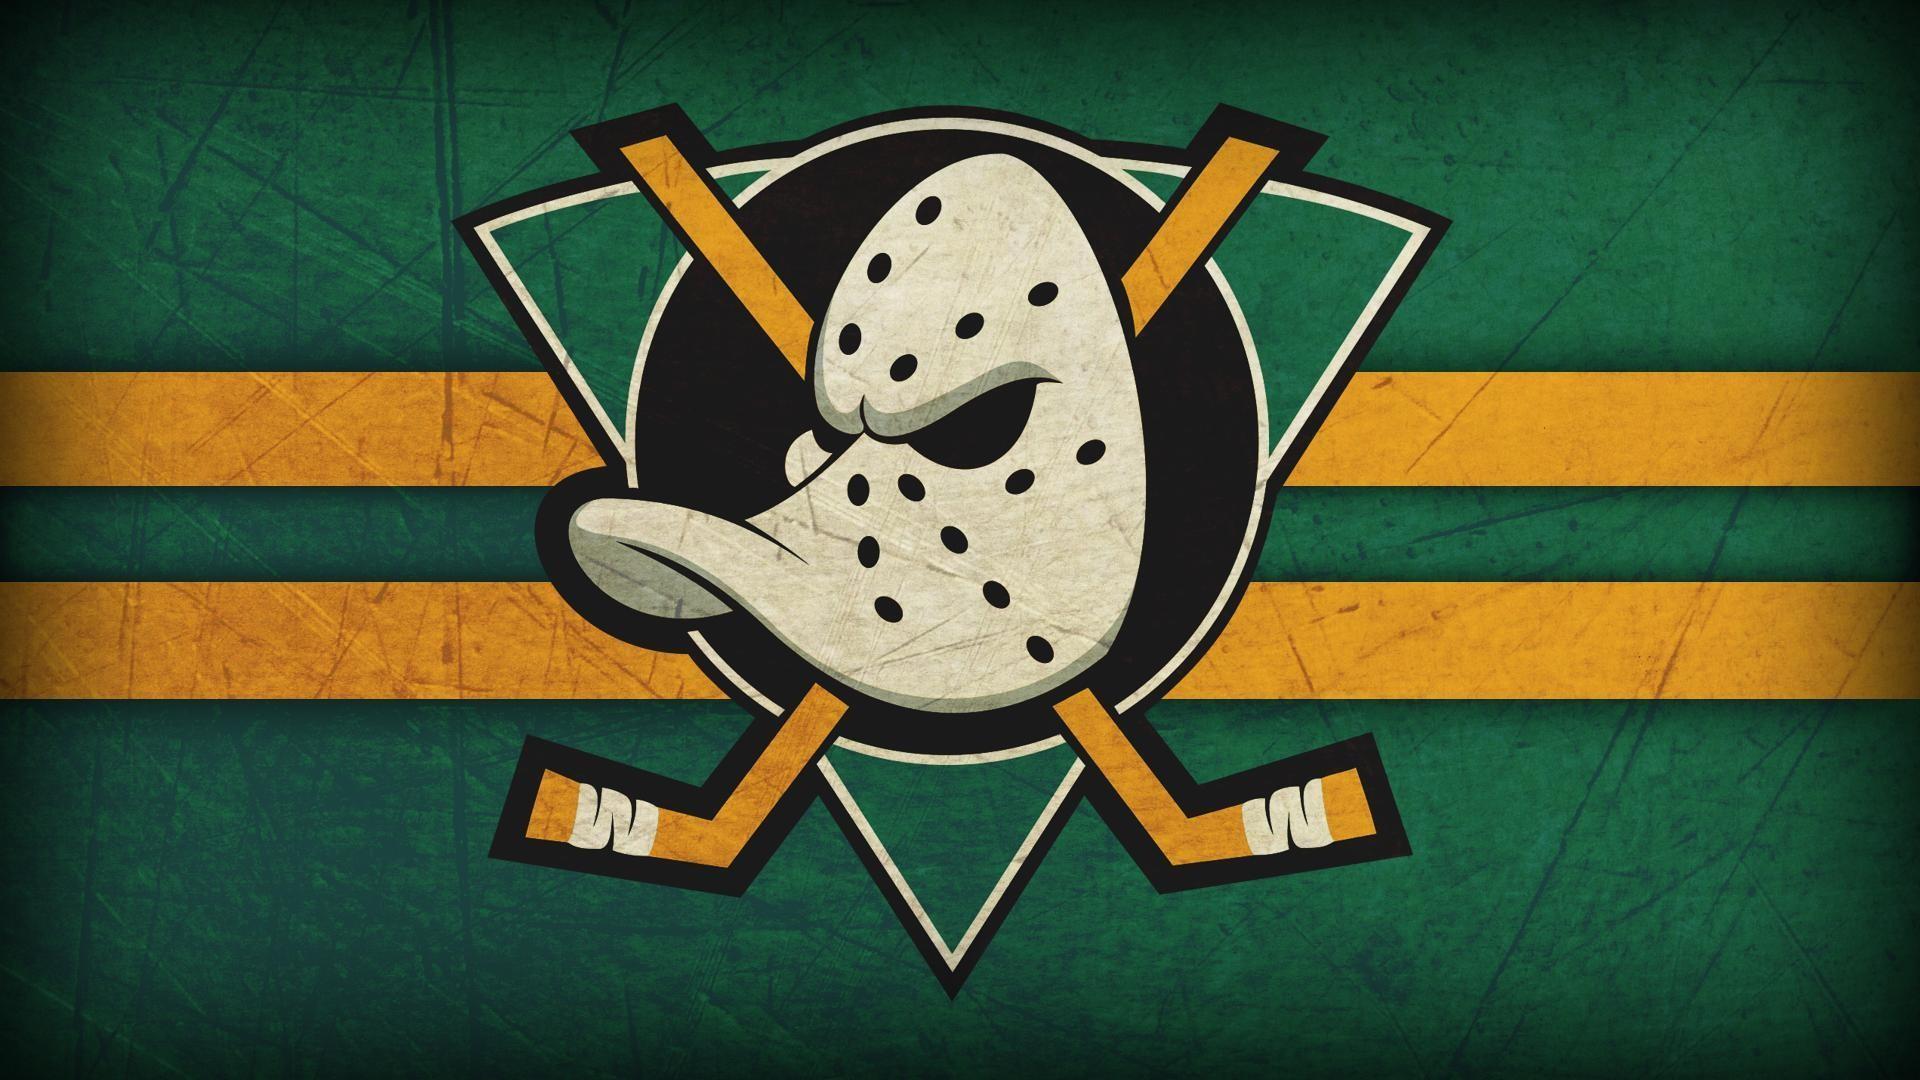 wallpaper.wiki-Free-Anaheim-Ducks-Picture-PIC-WPC004949